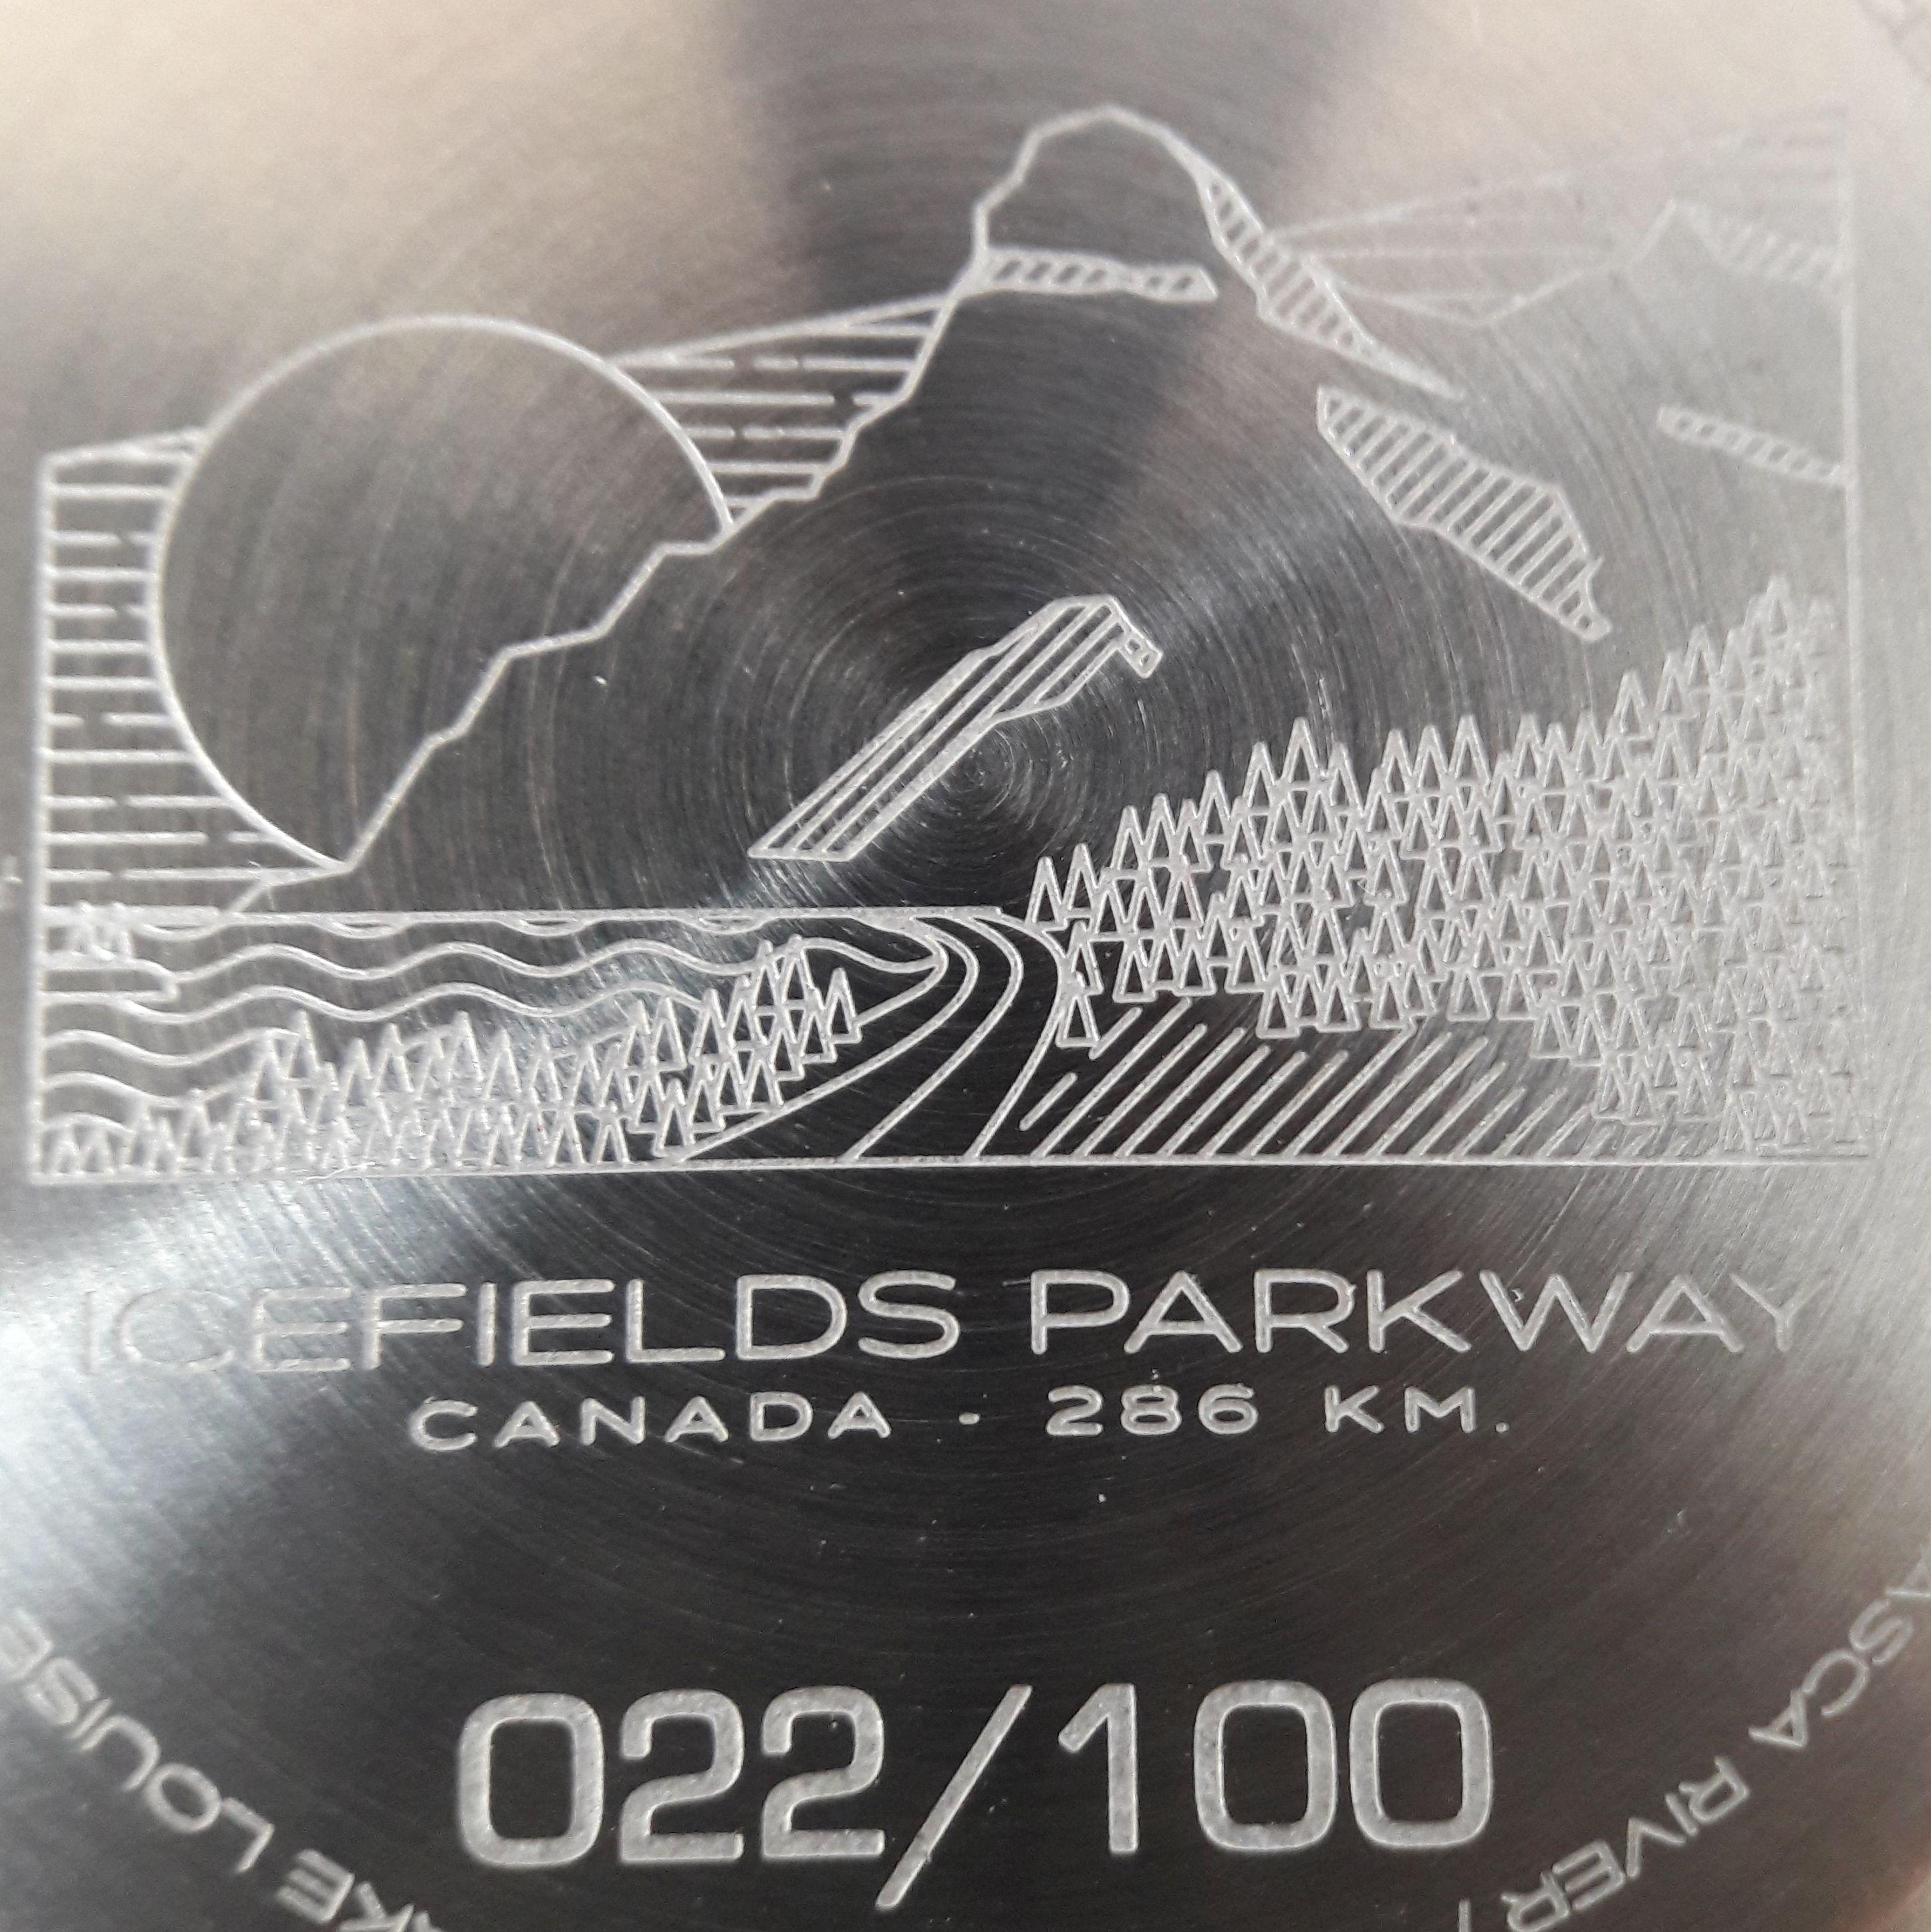 Montre Gavox Roads Icefields Parkway detail du fond